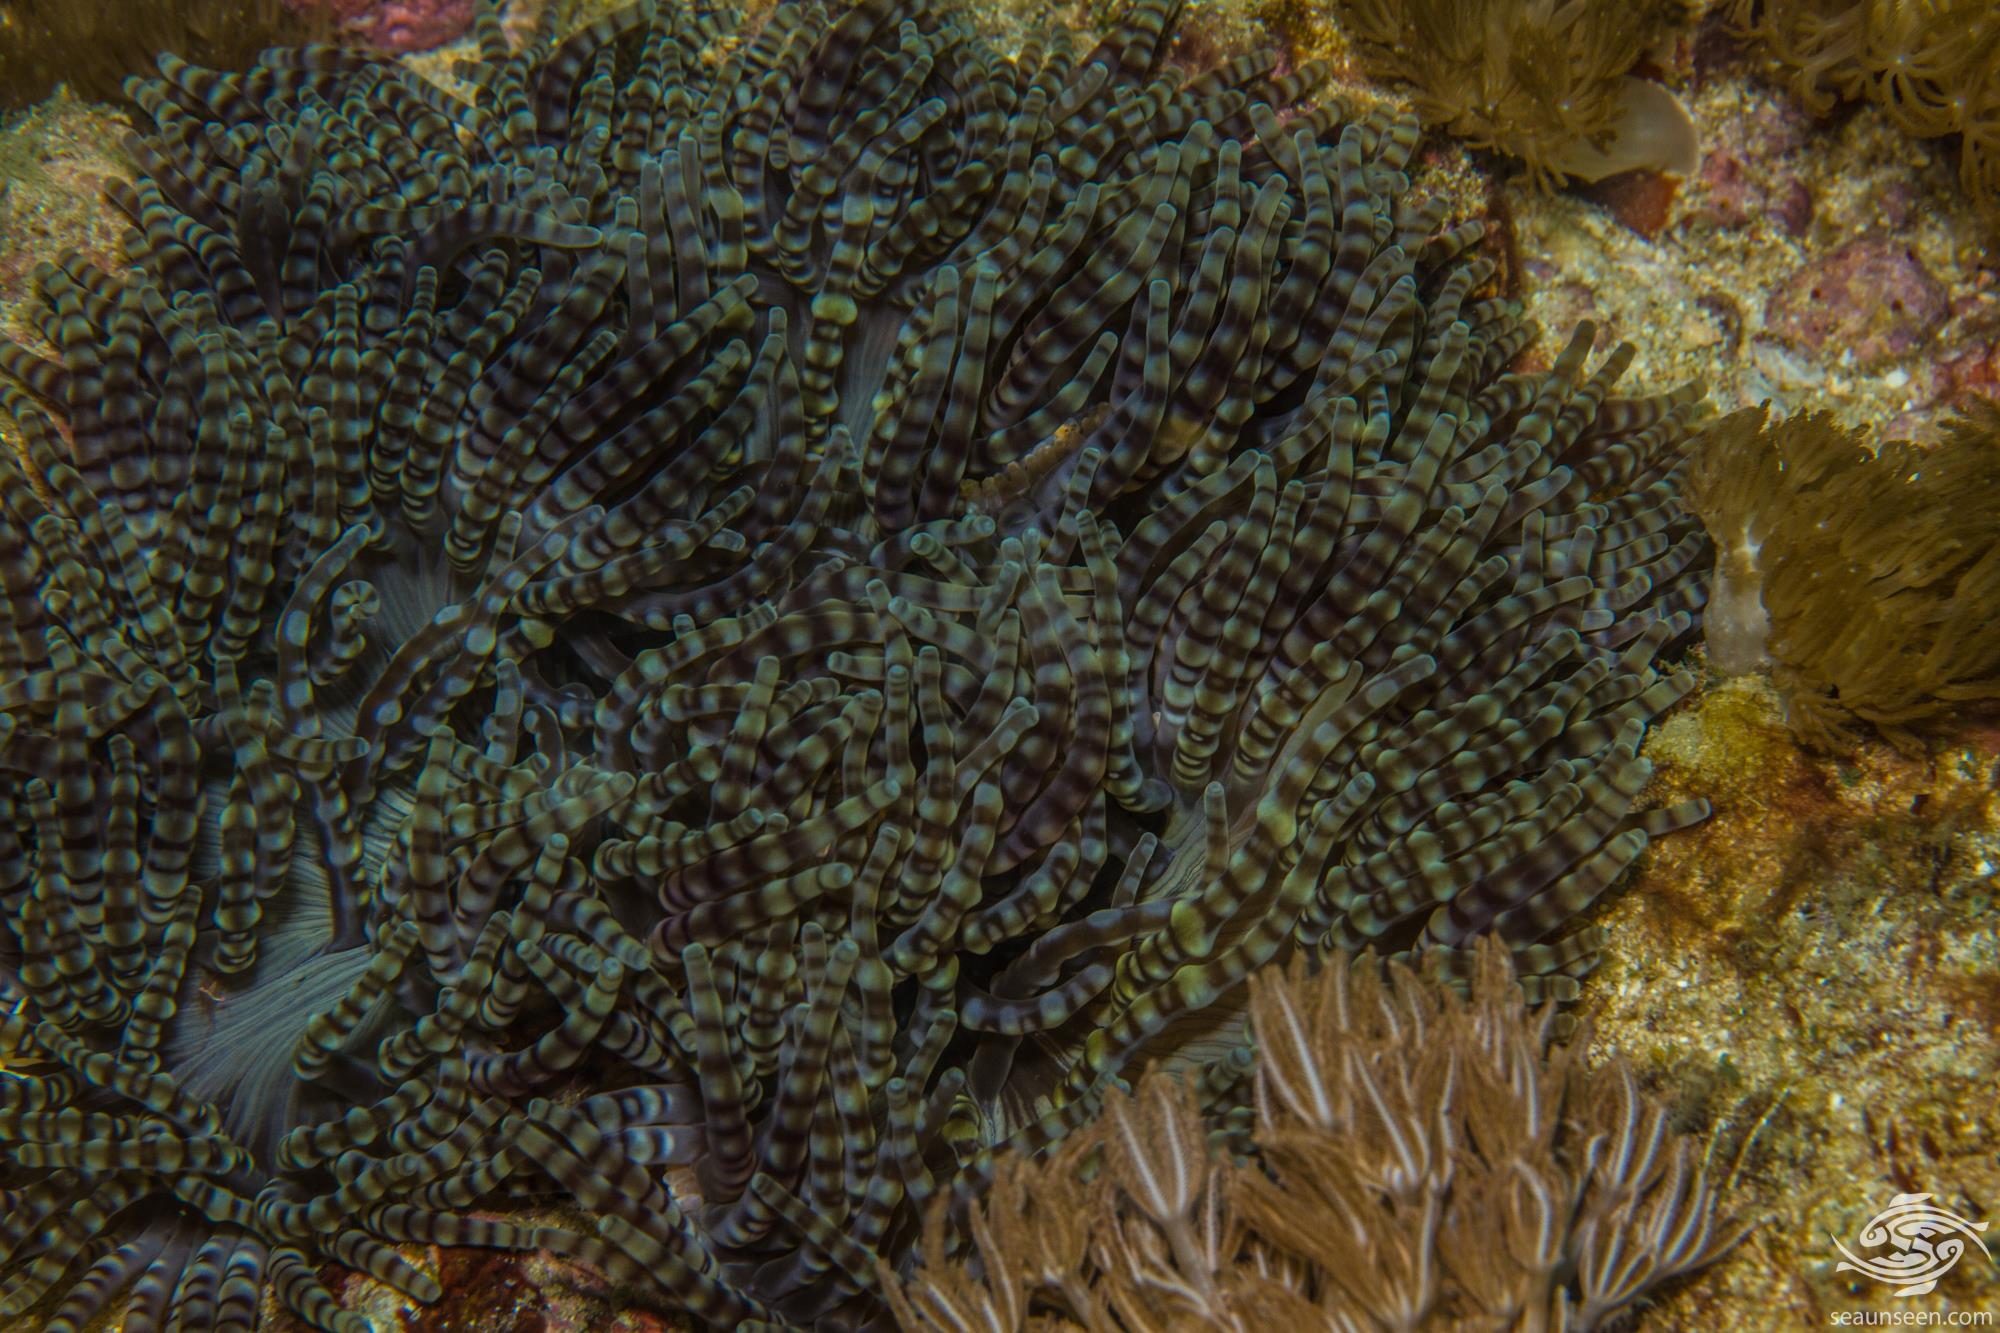 Beaded Anemone, Heteractis aurora is also known as the Aurora anemone or Beaded sand Anemone